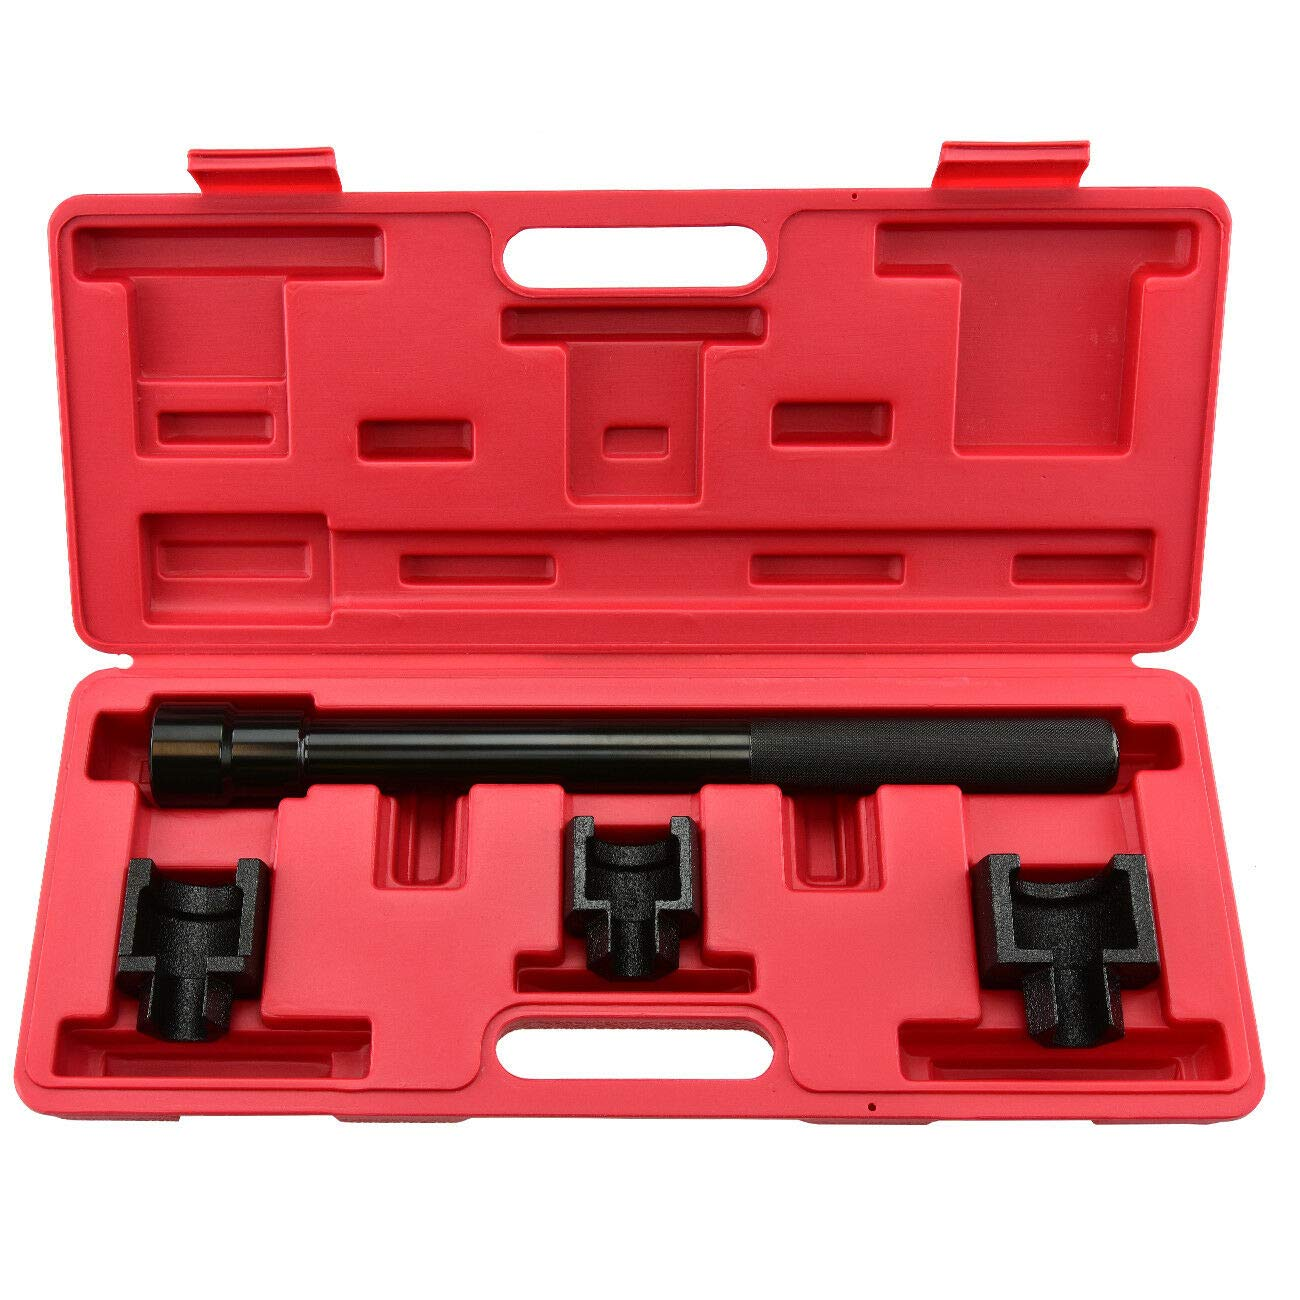 4pc Inner Tie Rod Removal Installation Set Mechanics Kit Dual Tie Rod Tools Auto